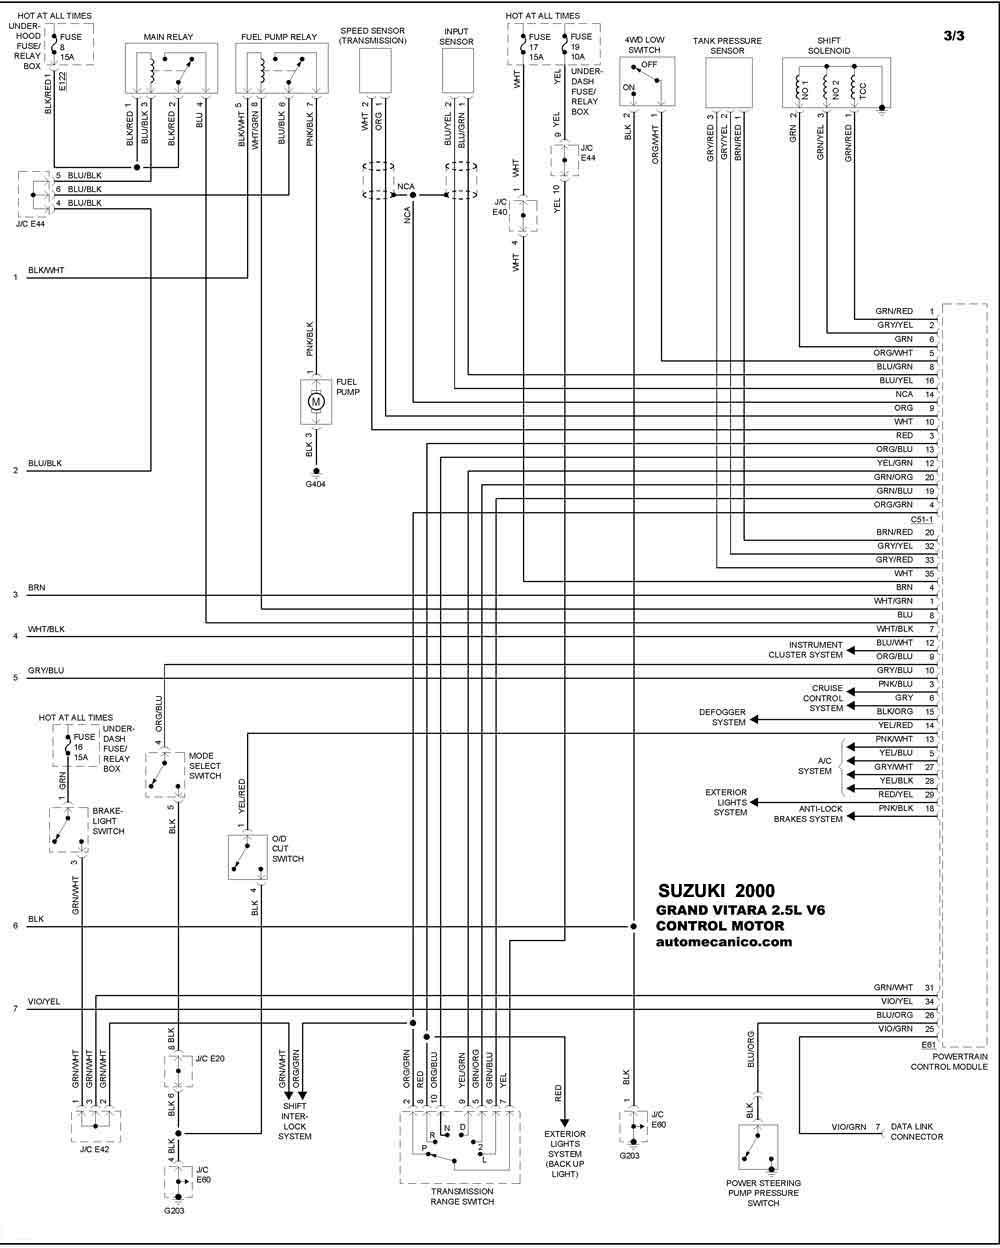 2000 suzuki grand vitara wiring diagram    suzuki       2000    diagramas control del motor vehiculos     suzuki       2000    diagramas control del motor vehiculos